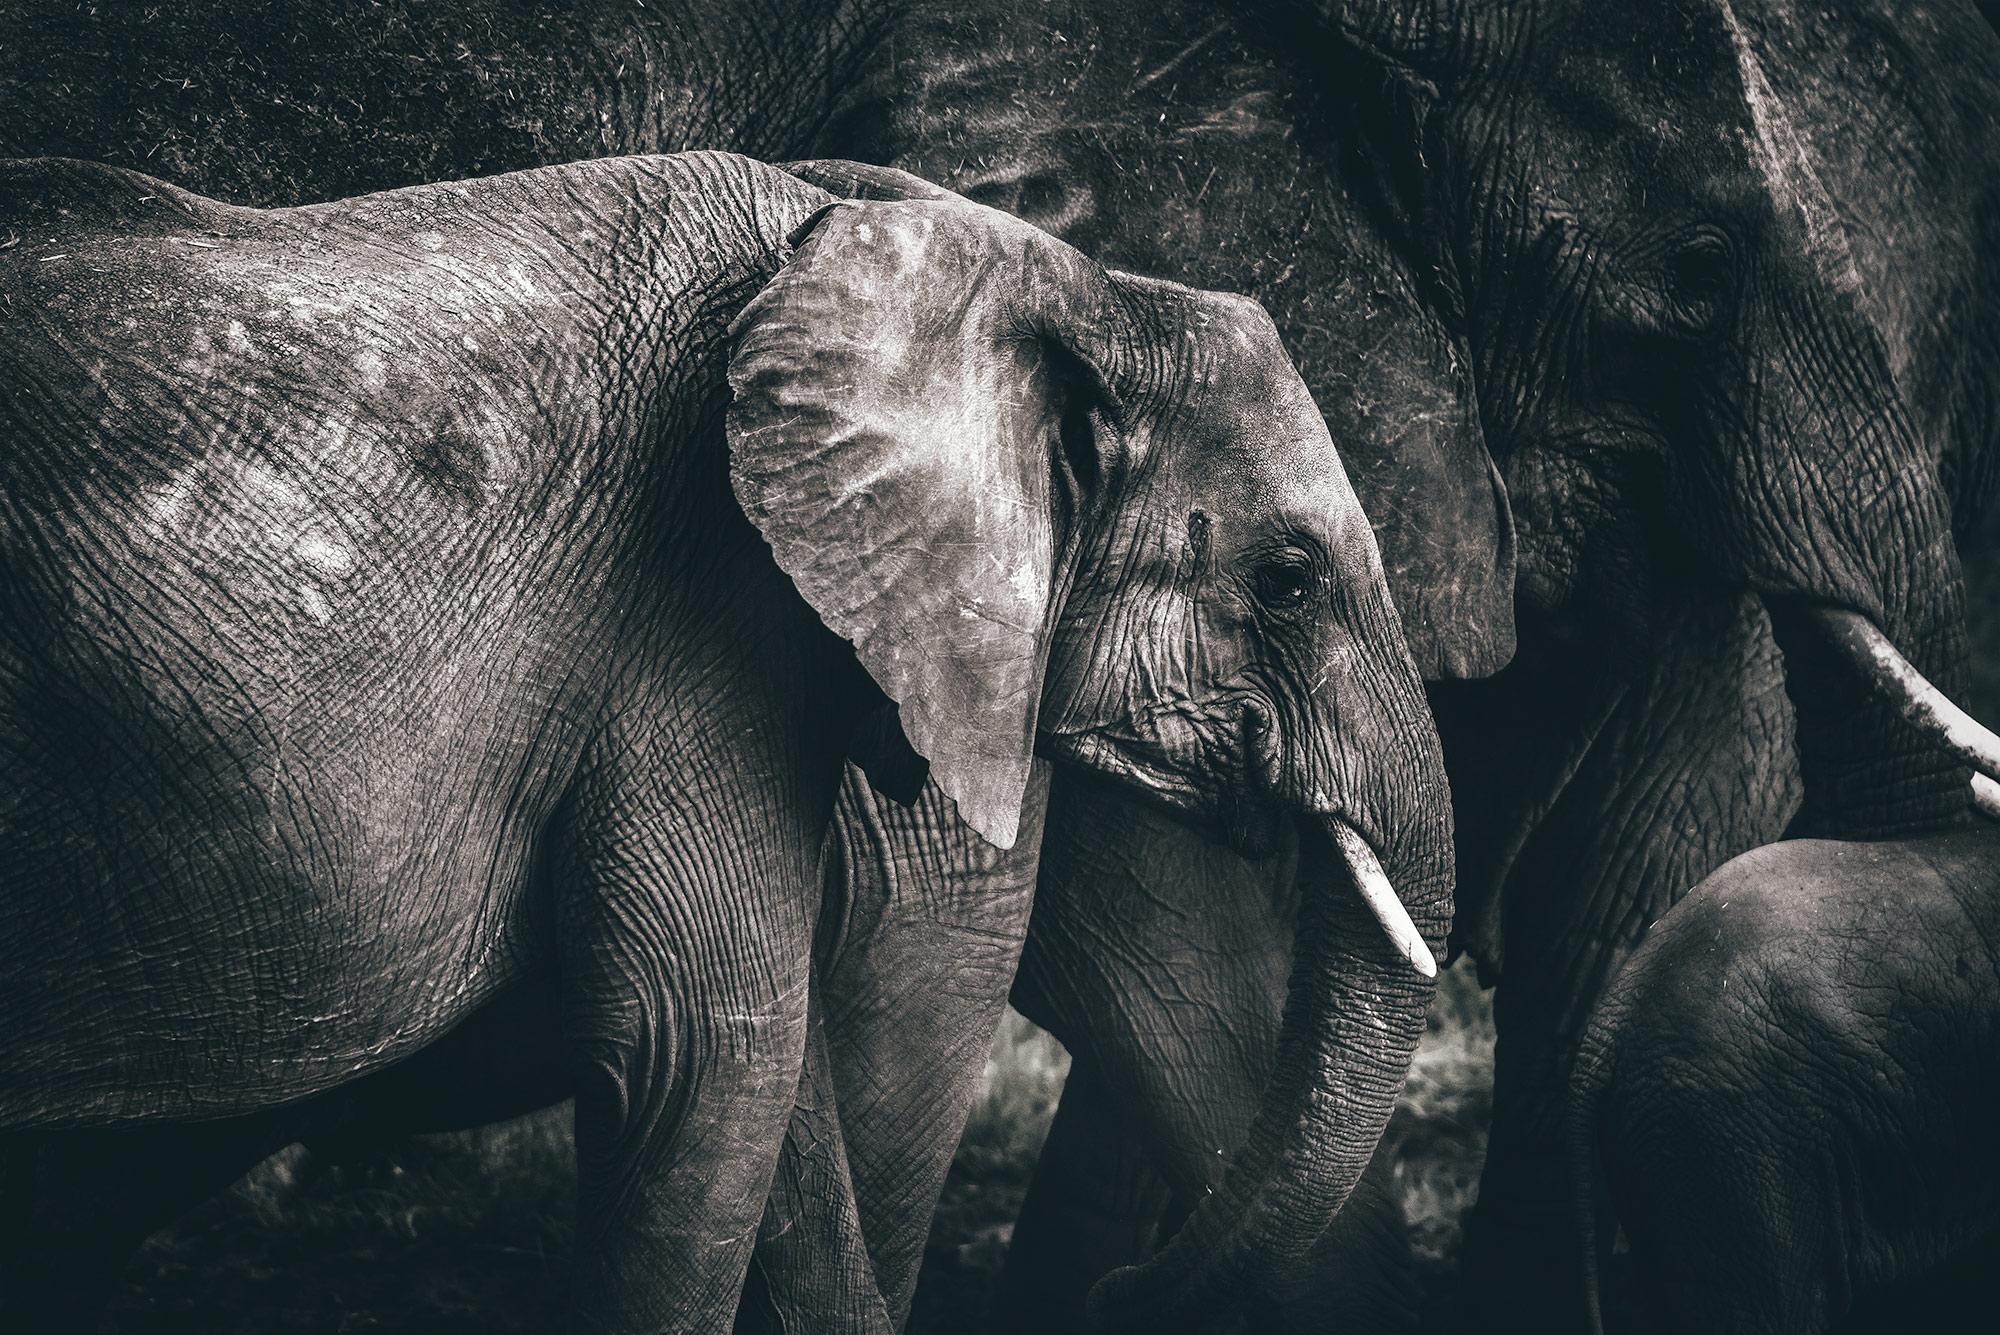 Serengeti-Elephant-2019.jpg